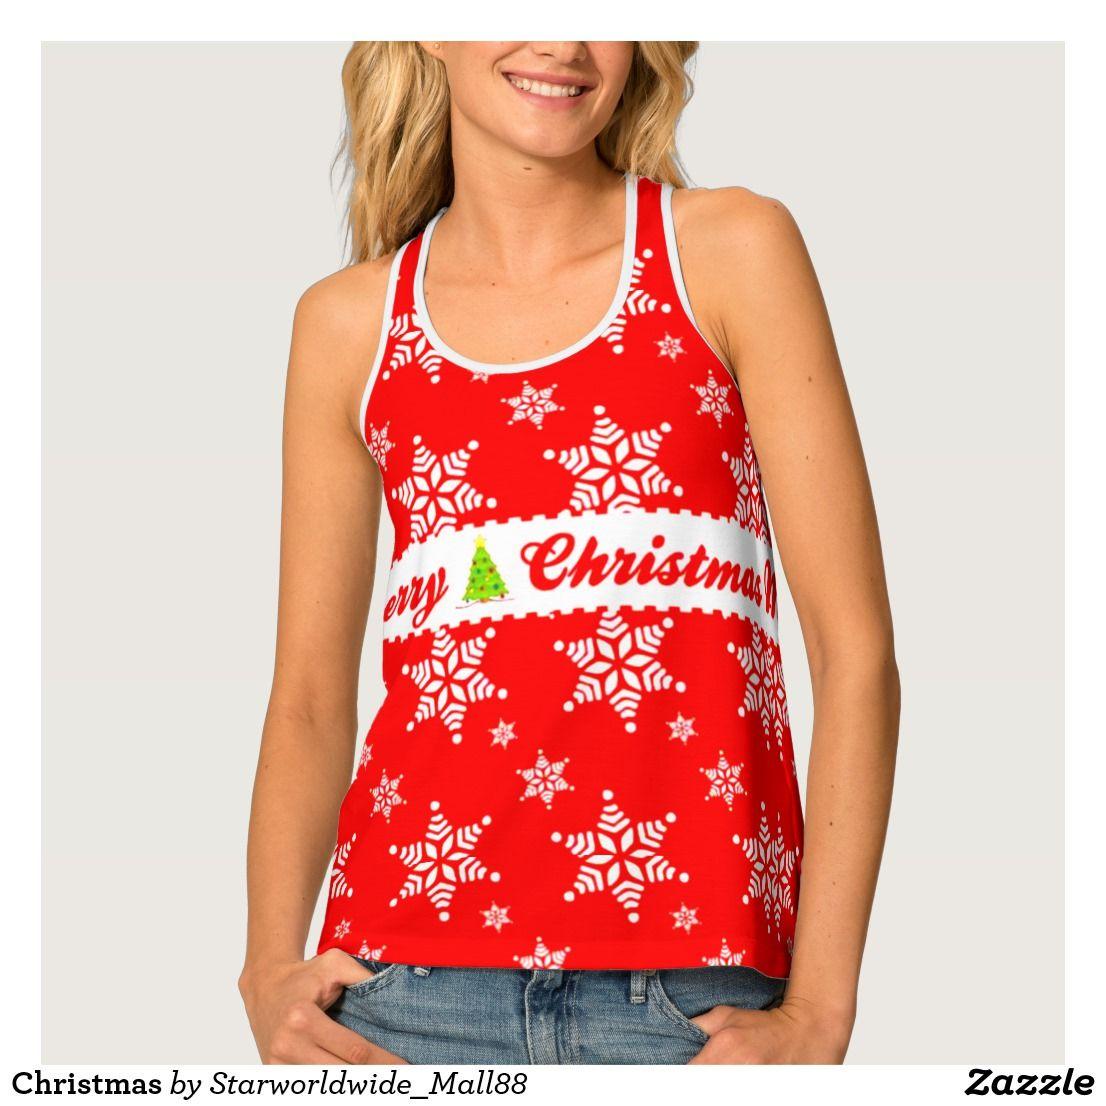 Funny Christmas Tank Tops.Christmas Tank Top Zazzle Com Christmas In July Tank Tops